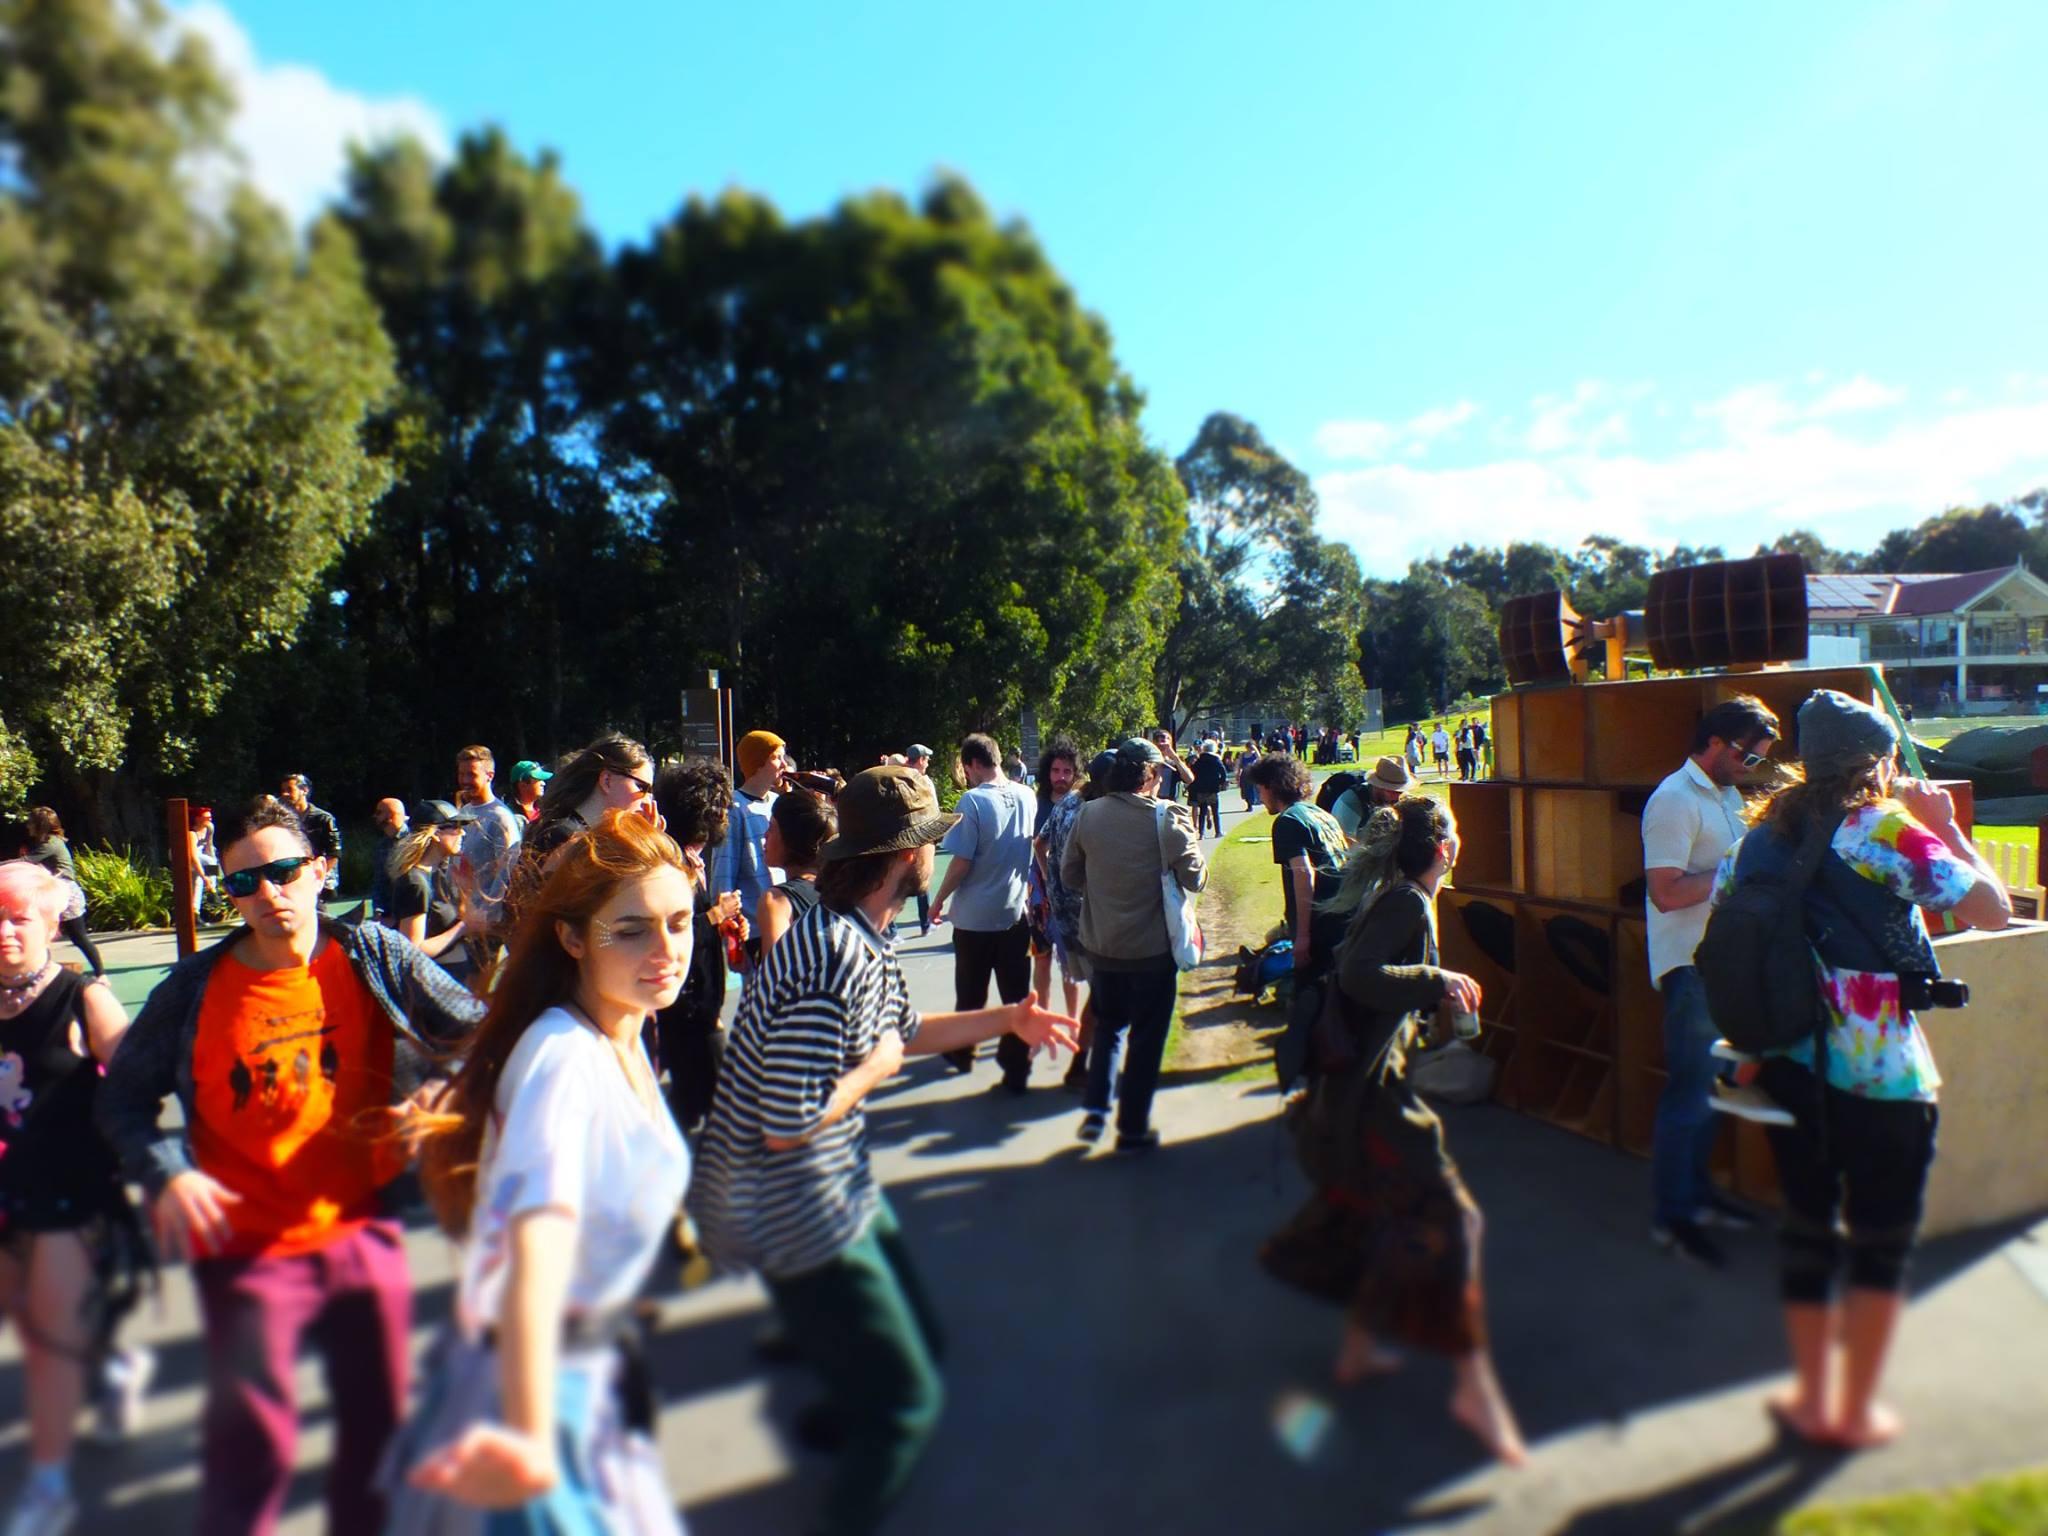 Save_Sydney_Park_Festival.jpg